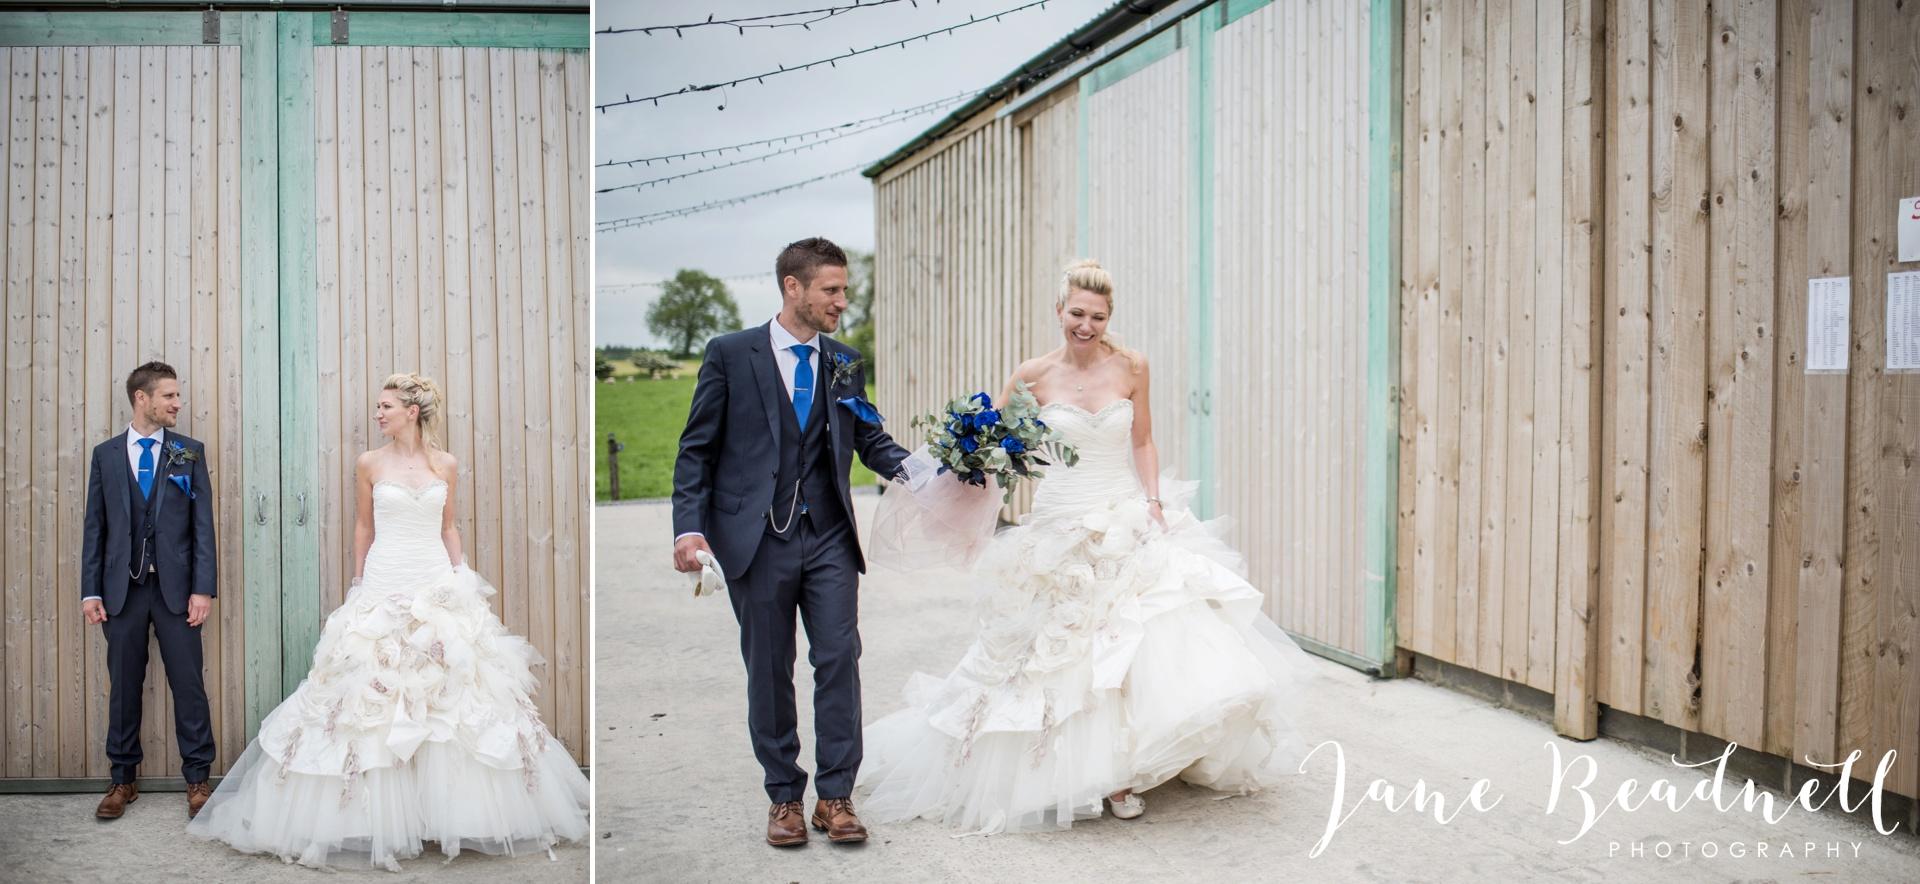 Hill Top Farm Wedding Photography Masham by Jane Beadnell Photography_0071